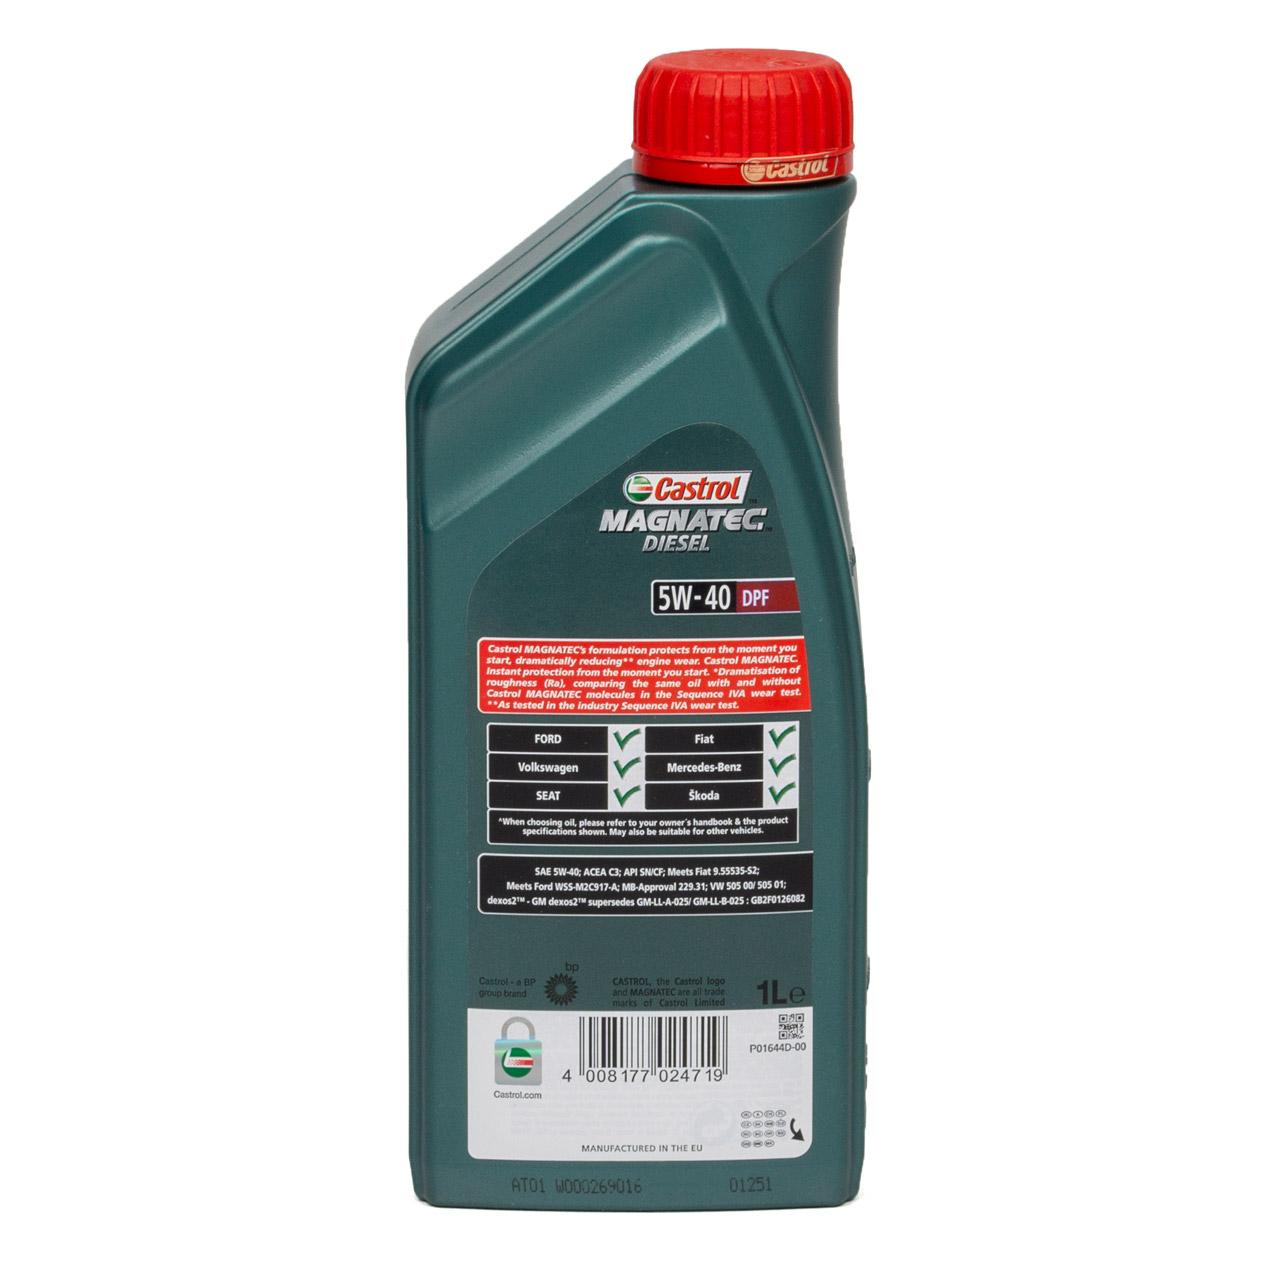 CASTROL Magnatec DIESEL DPF Motoröl Öl 5W40 dexos2 Ford WSS-M2C917-A - 1 Liter